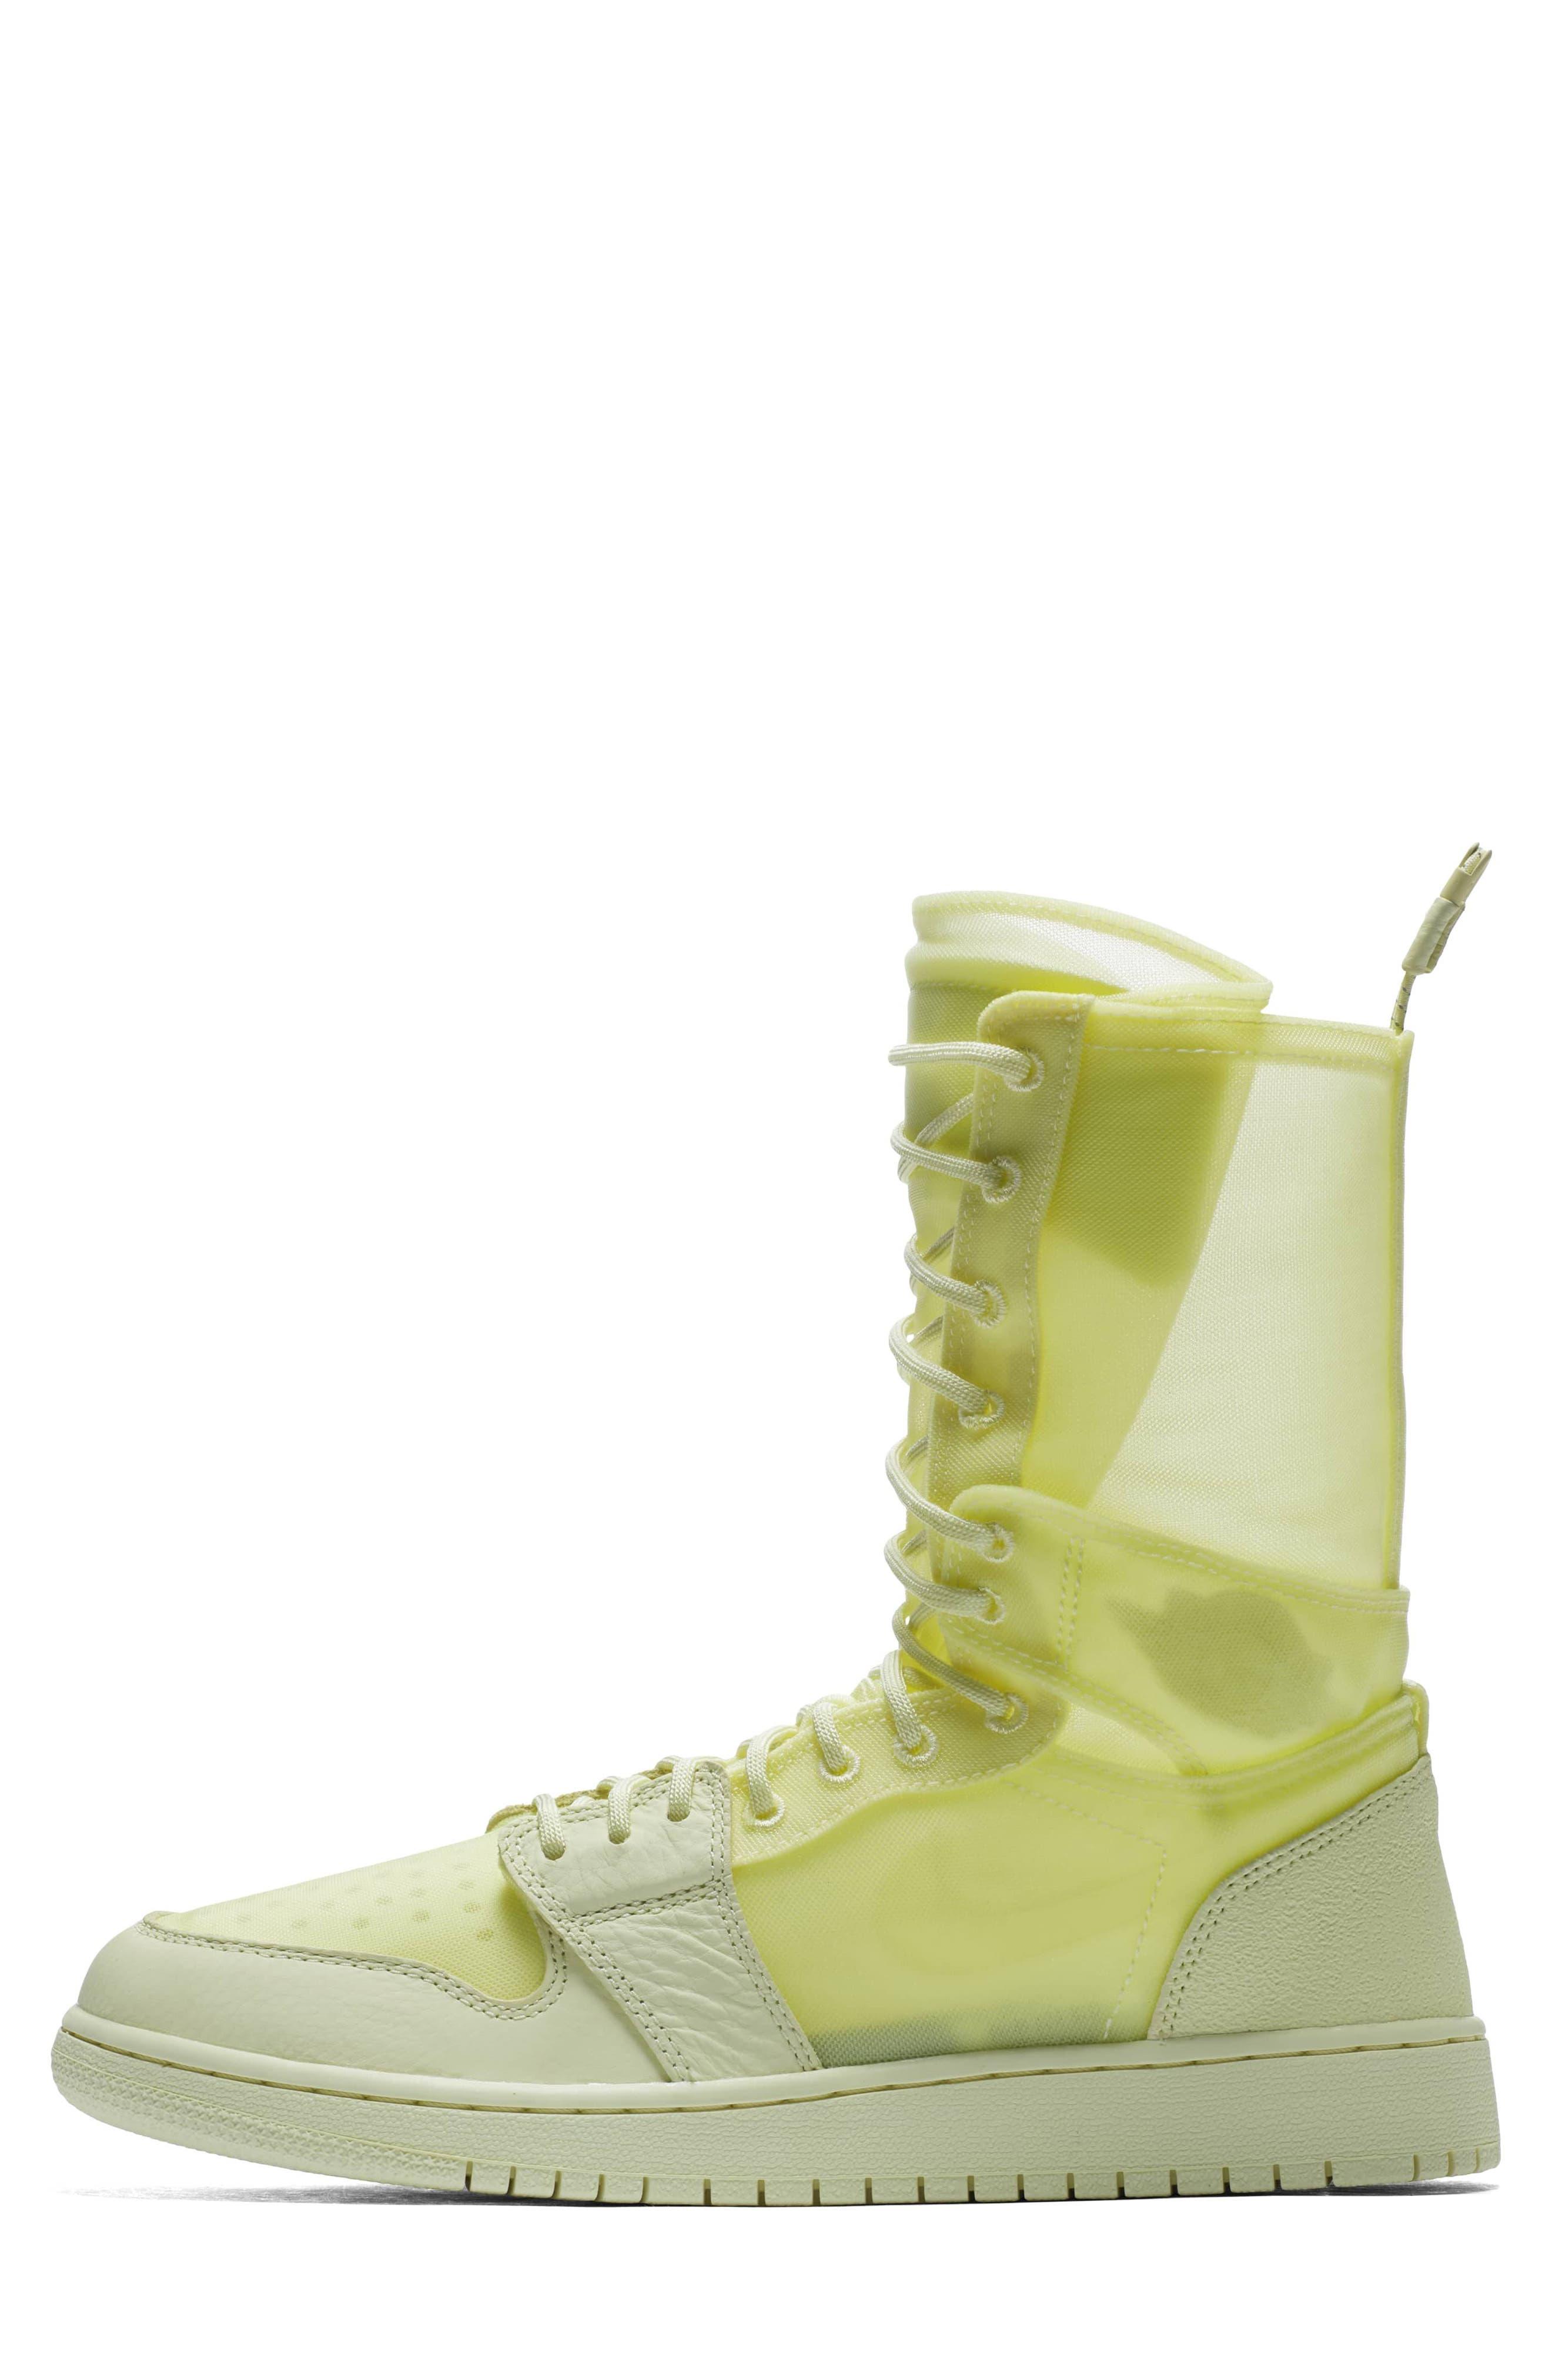 Air Jordan 1 Explorer XX Convertible High Top Sneaker,                             Alternate thumbnail 6, color,